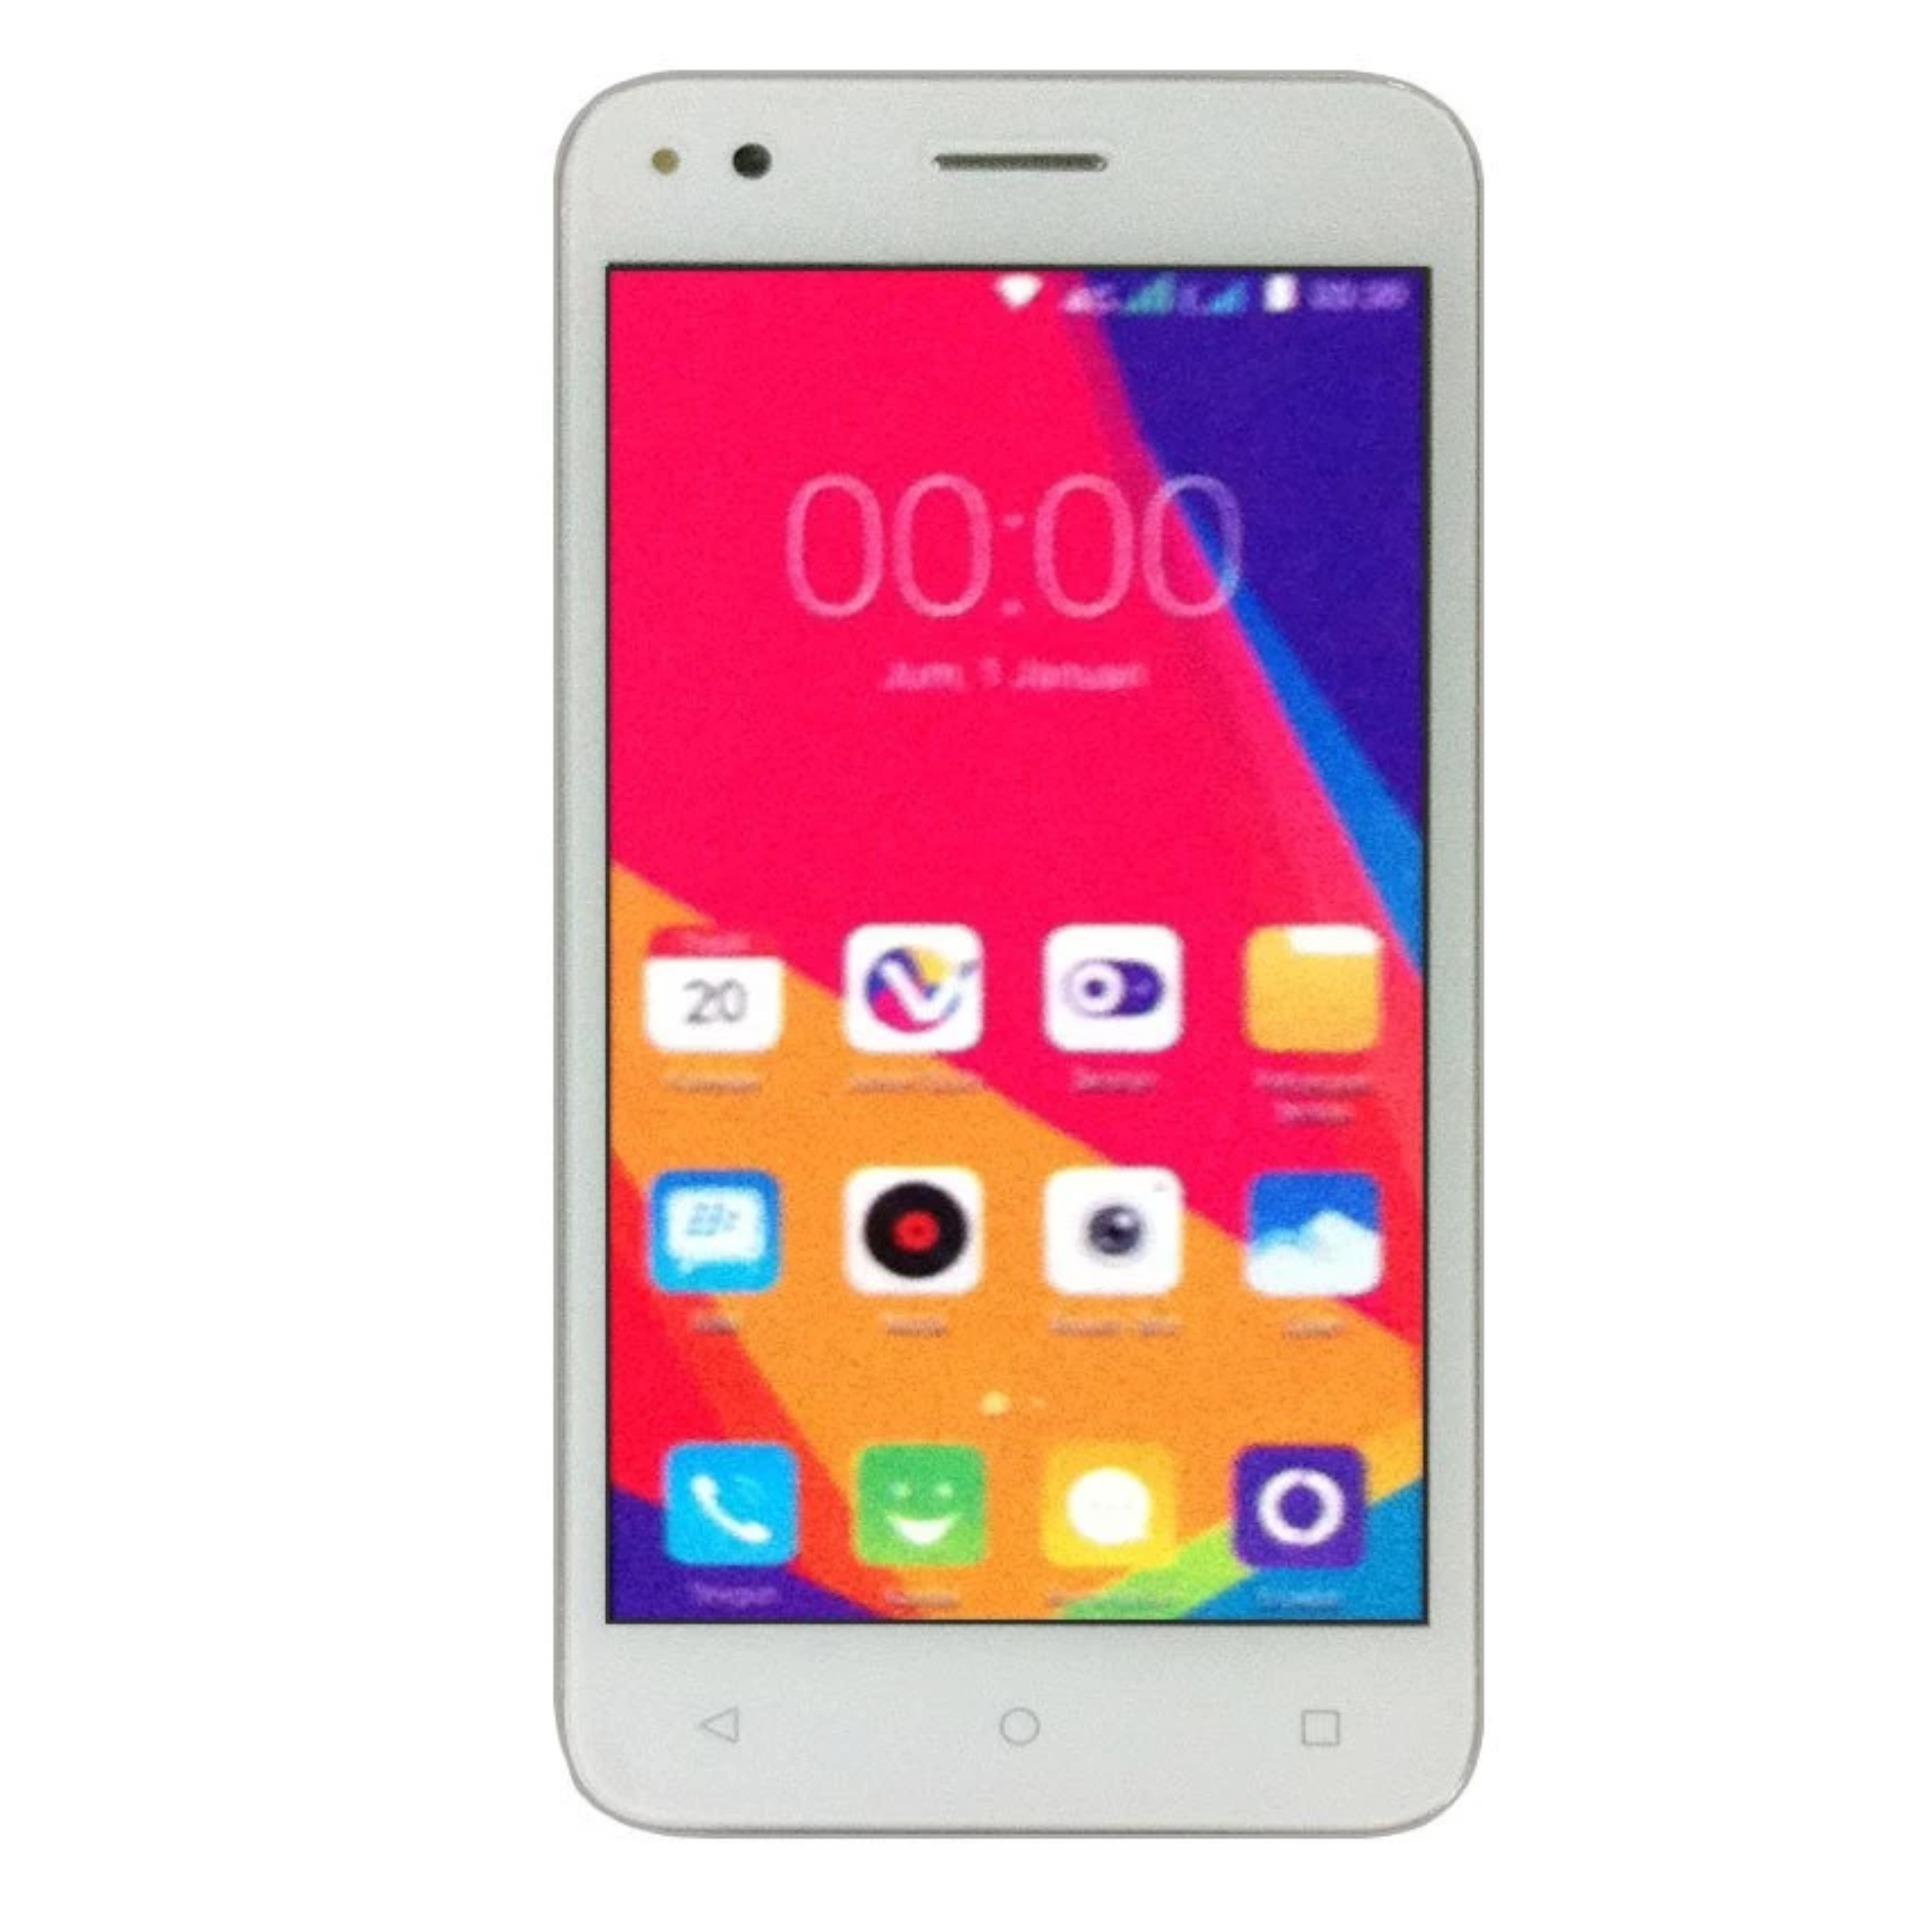 Harga Advan M4 3g Ram 512mb Rom 4gb Android Dual Camera Hp Info I5c 4g Lte Quadcore Plus